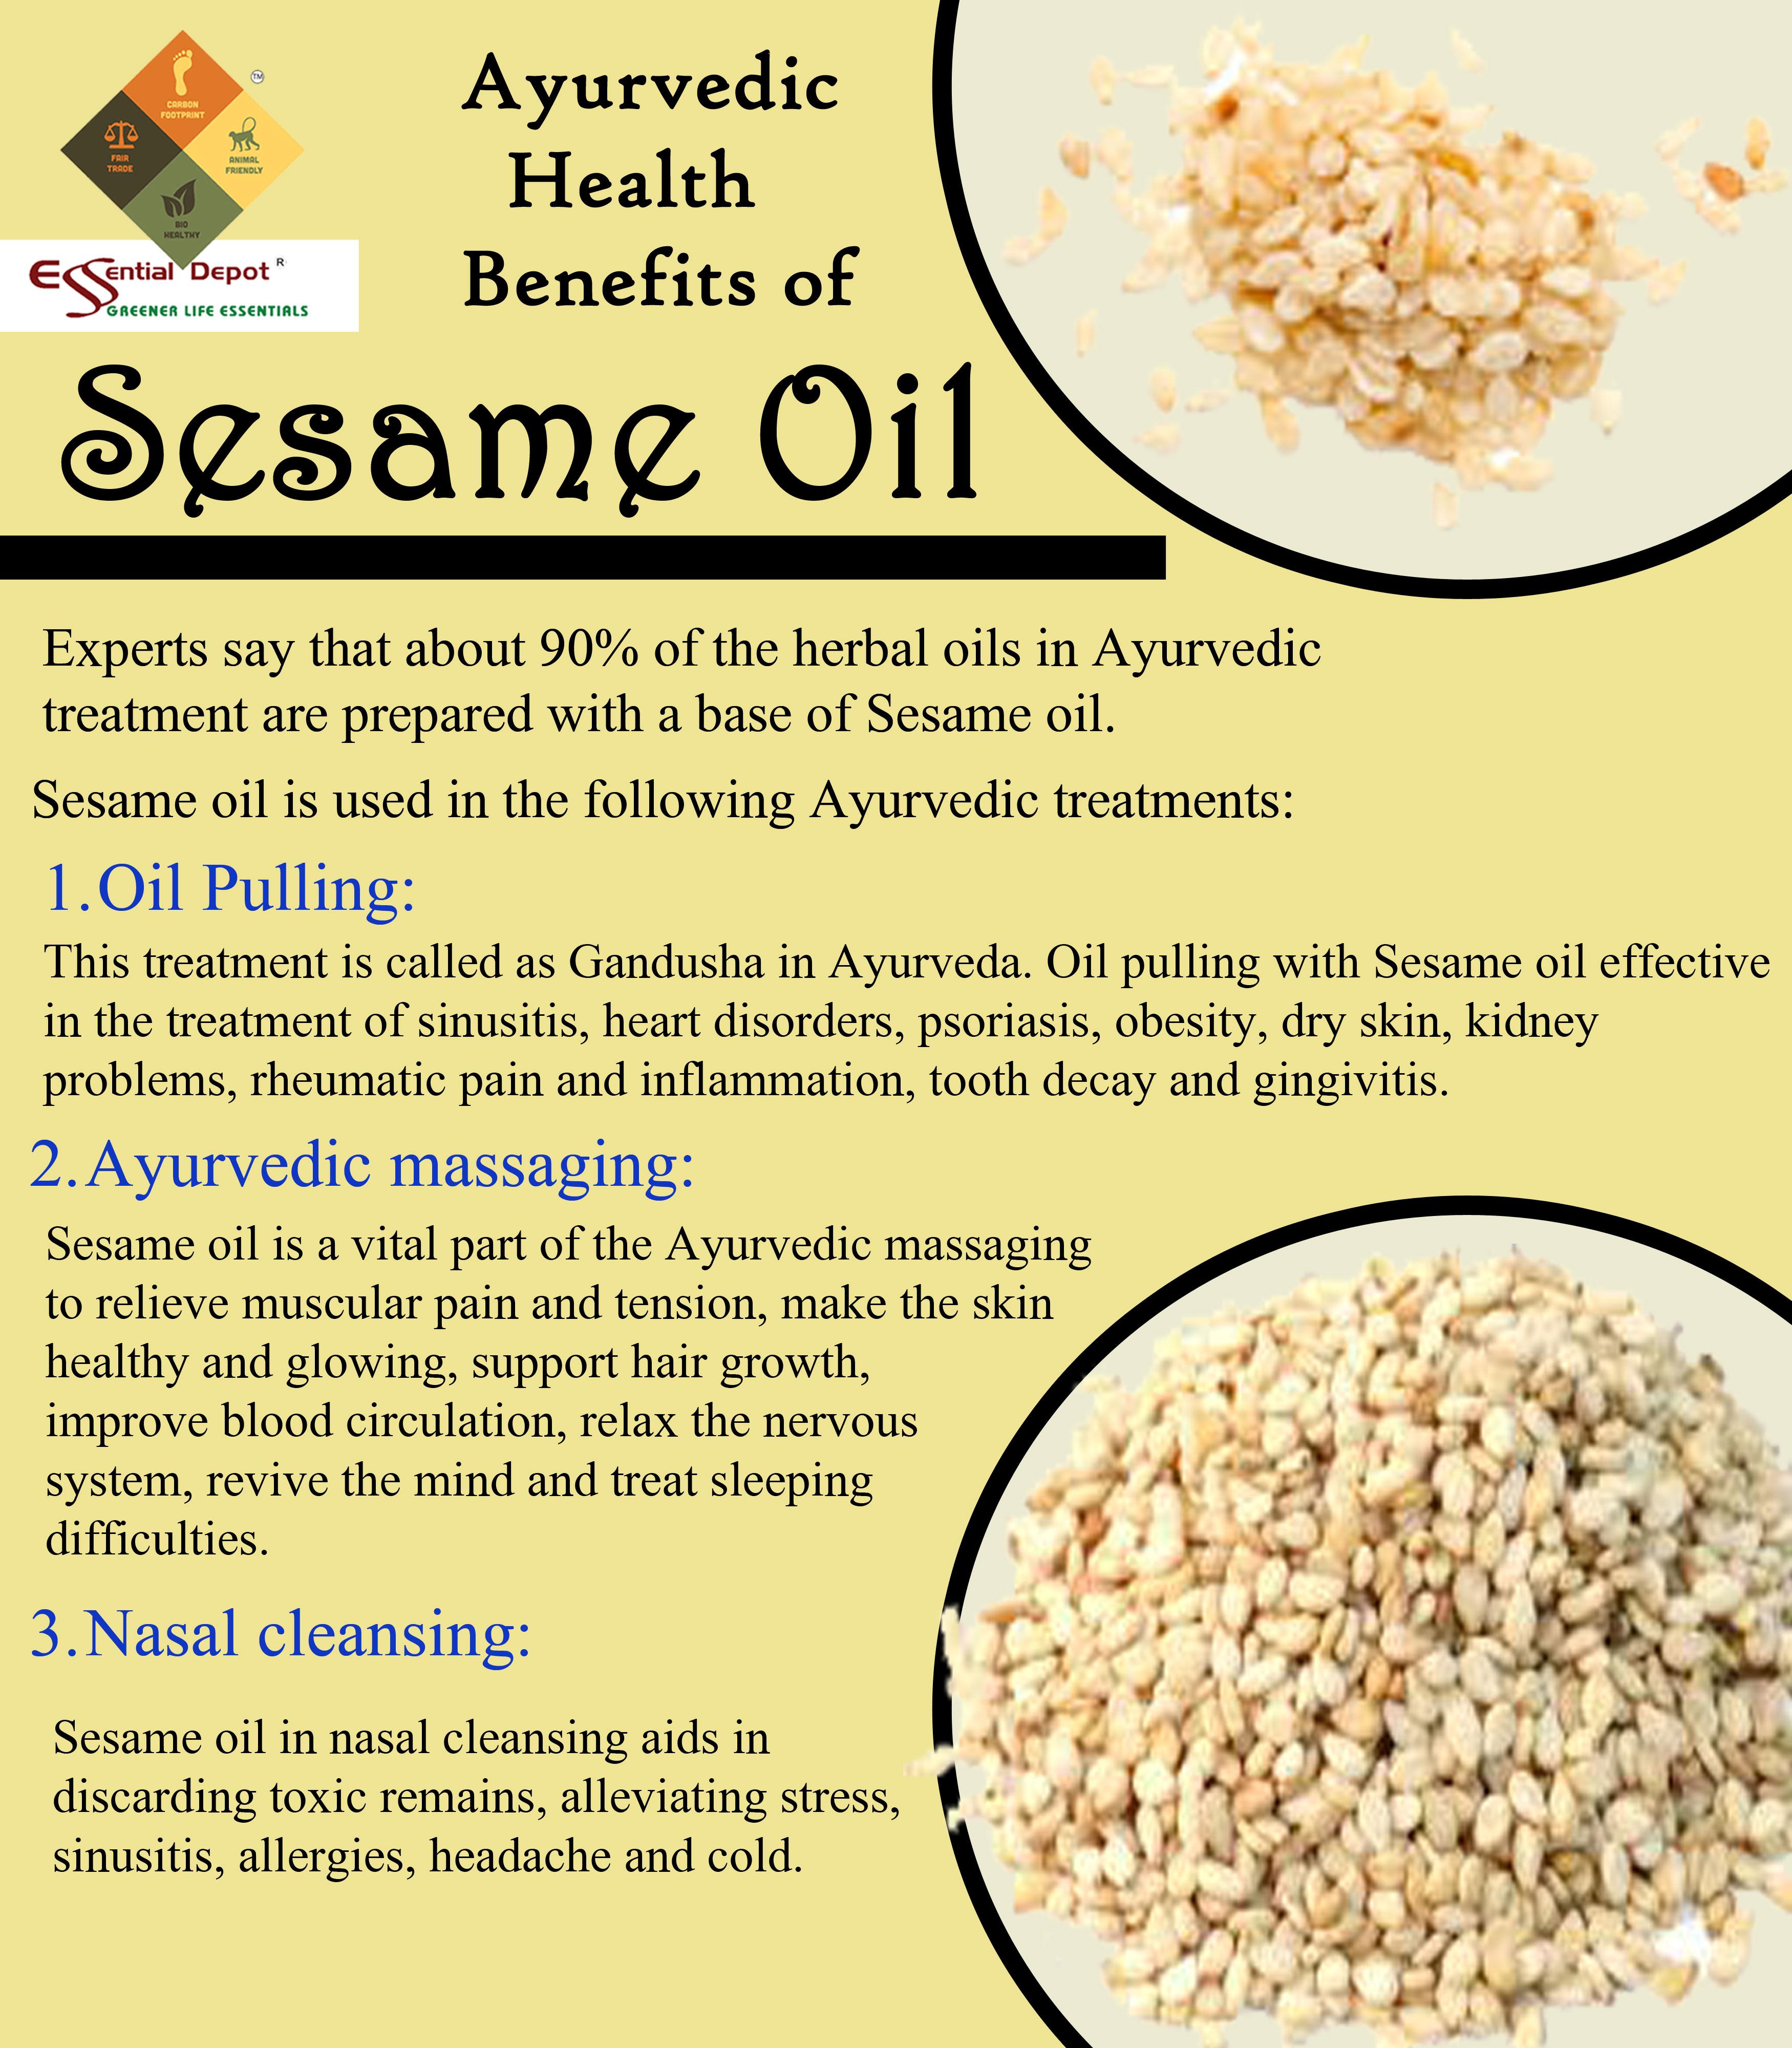 Sesame-Broucher